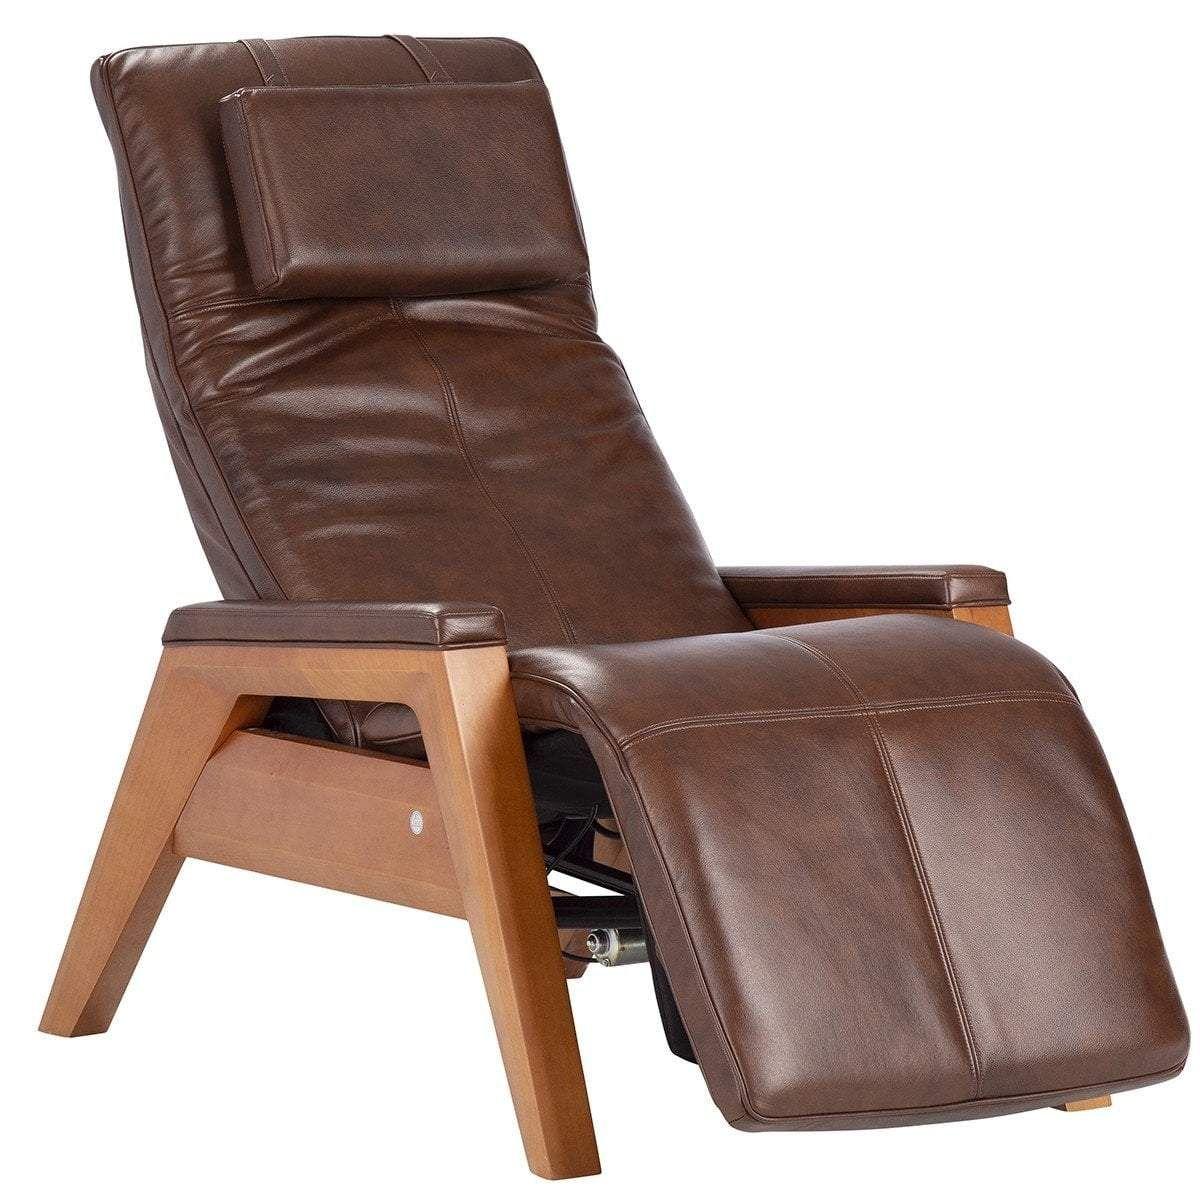 Human Touch Gravis Zg Chair Zero Gravity Recliner Zero Gravity Recliner Chair Zero Gravity